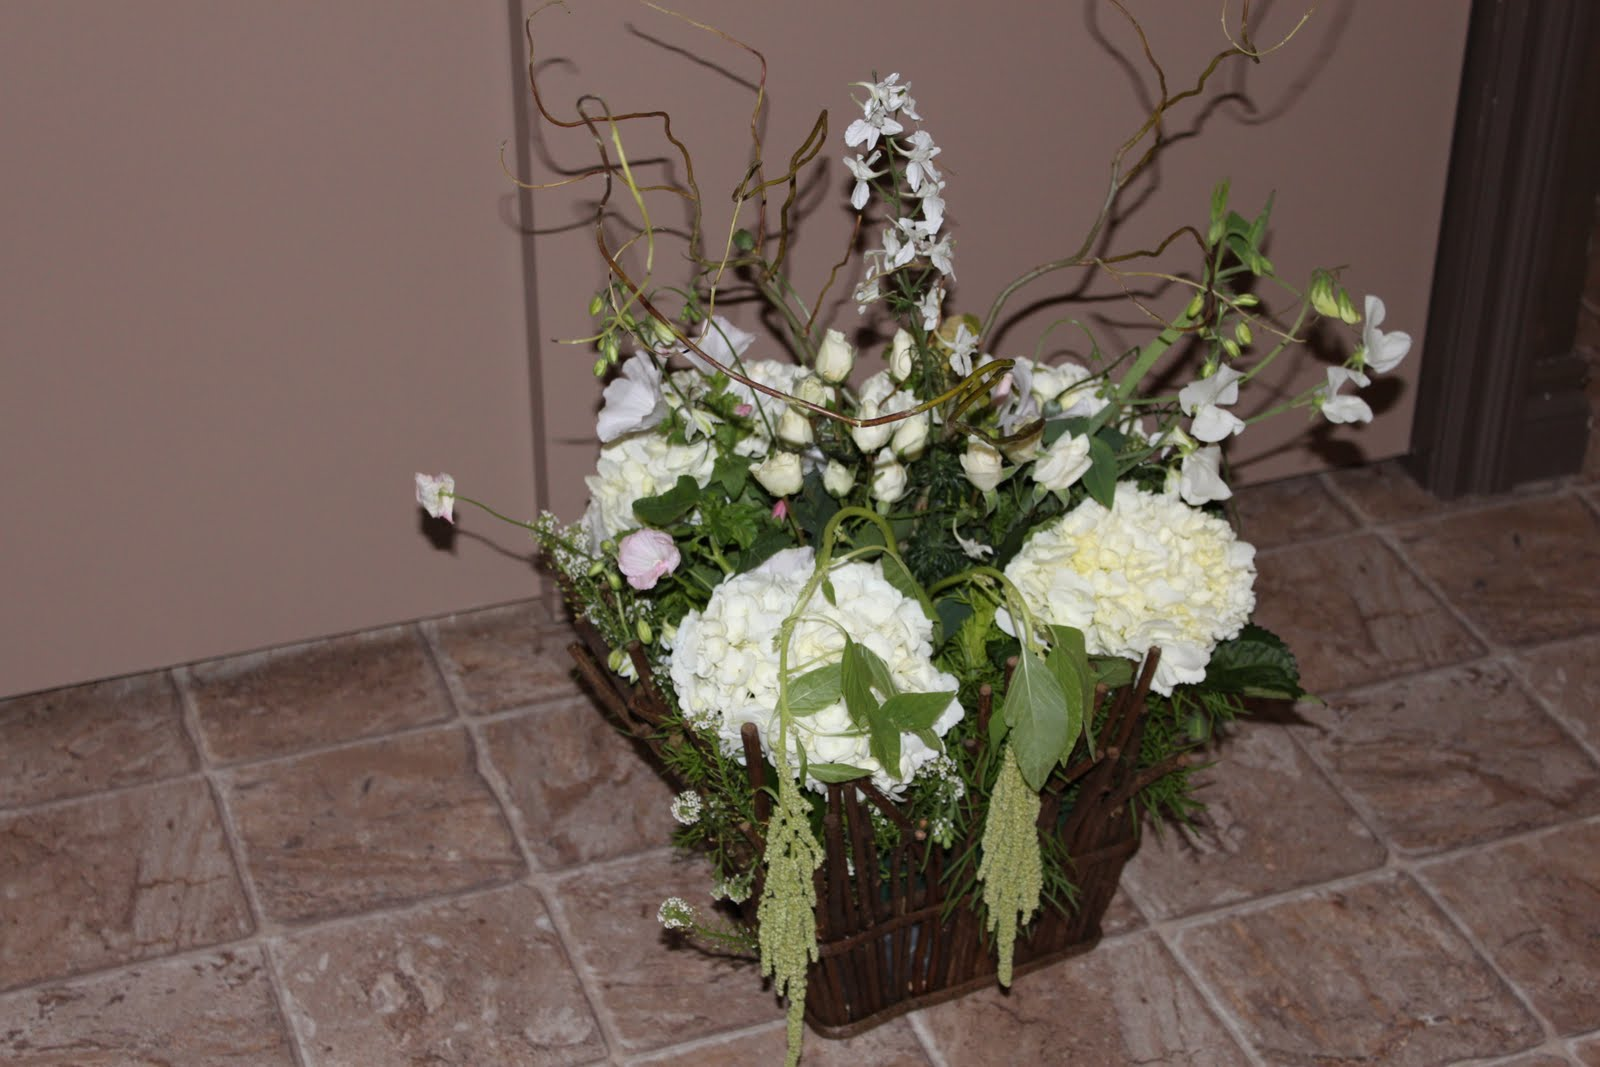 Modern Rustic Centerpiece : Daffodil floral designs modern rustic reception centerpieces